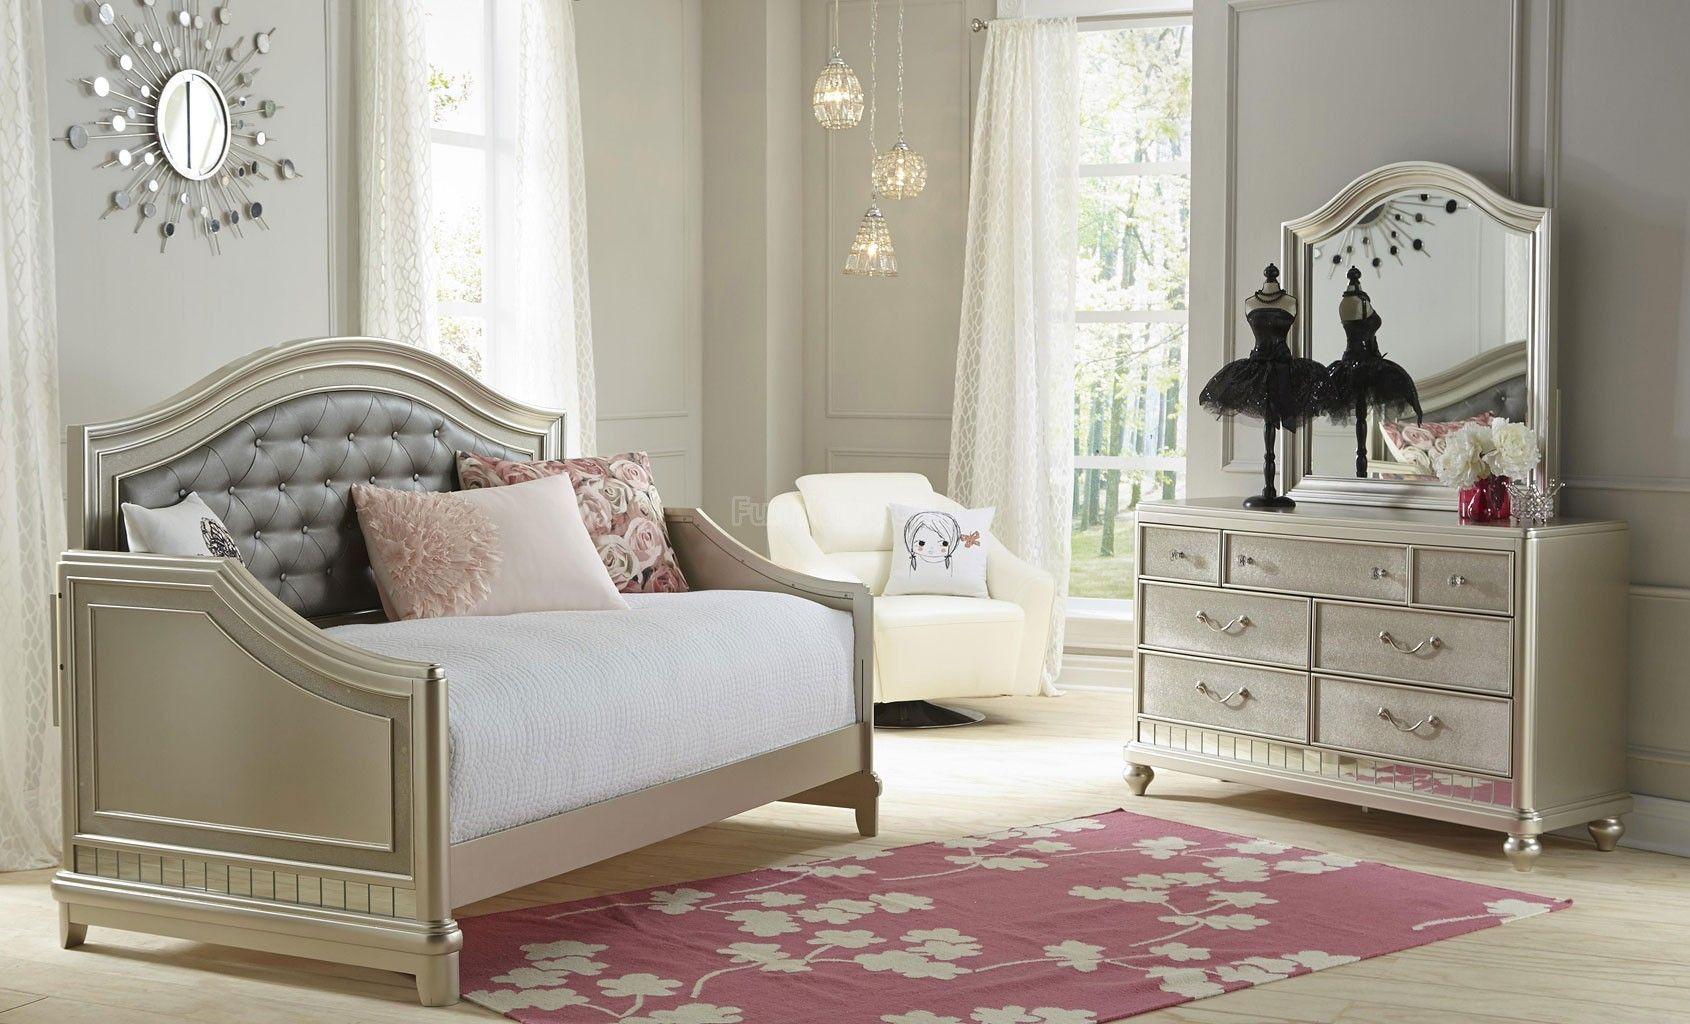 Lil Diva Daybed Bedroom Set | Its All About Kids! | Bedroom ...